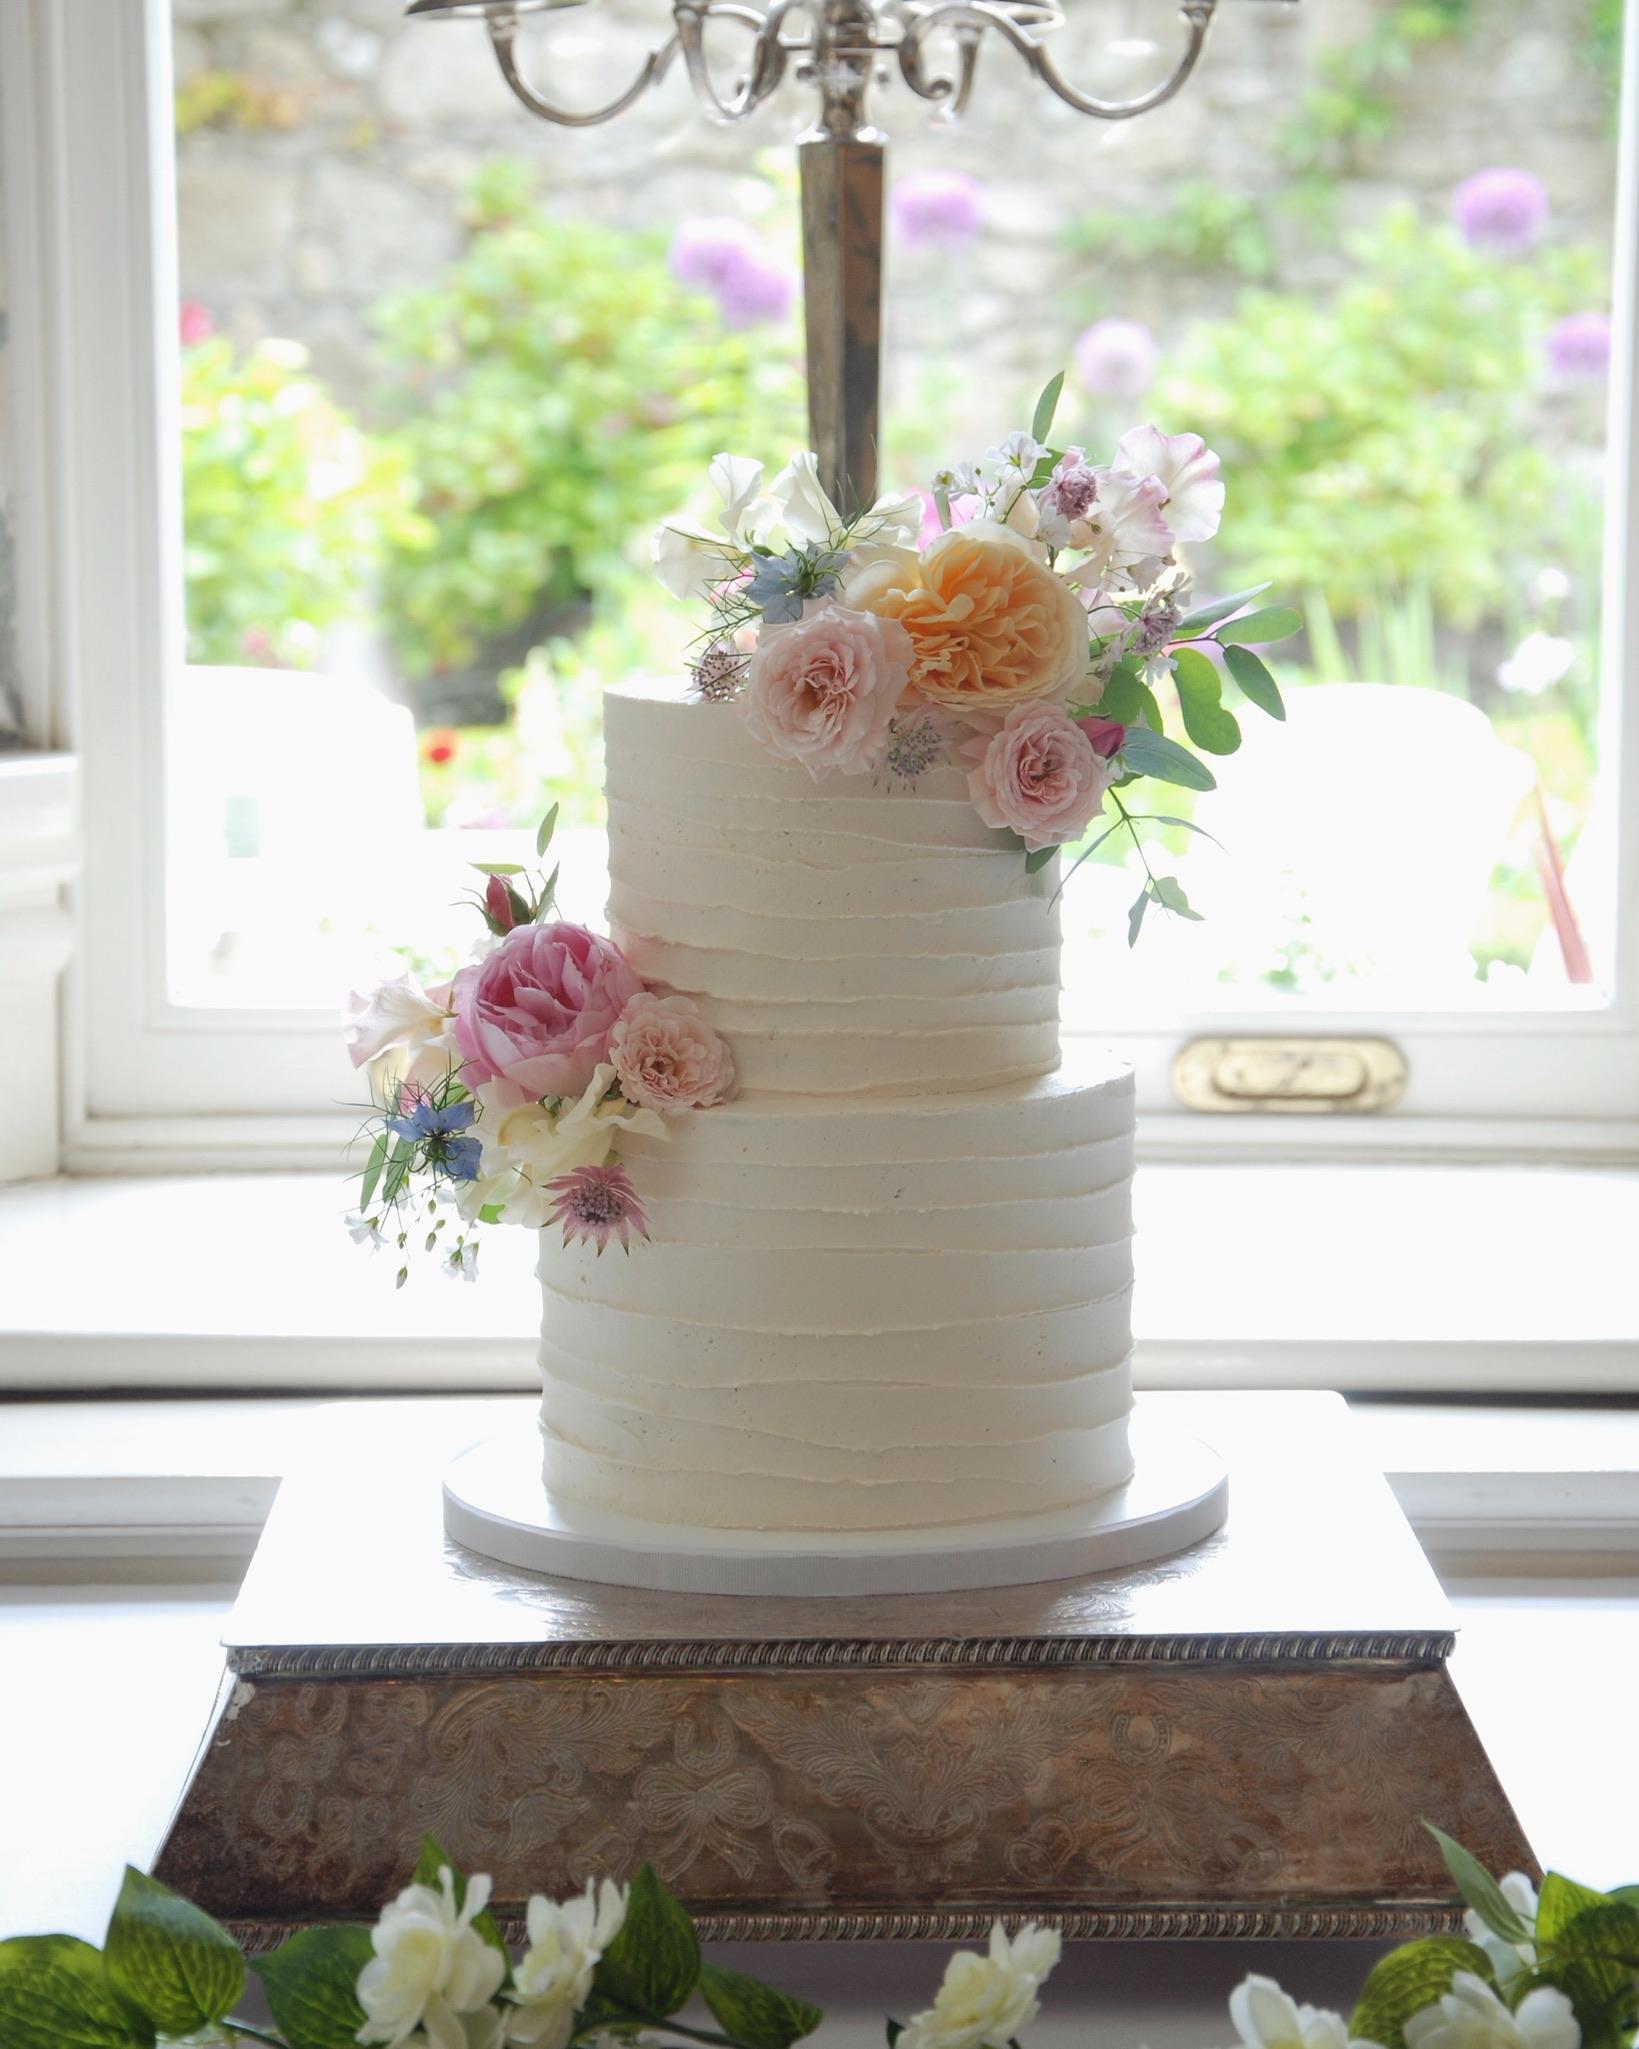 Combed buttercream wedding cake